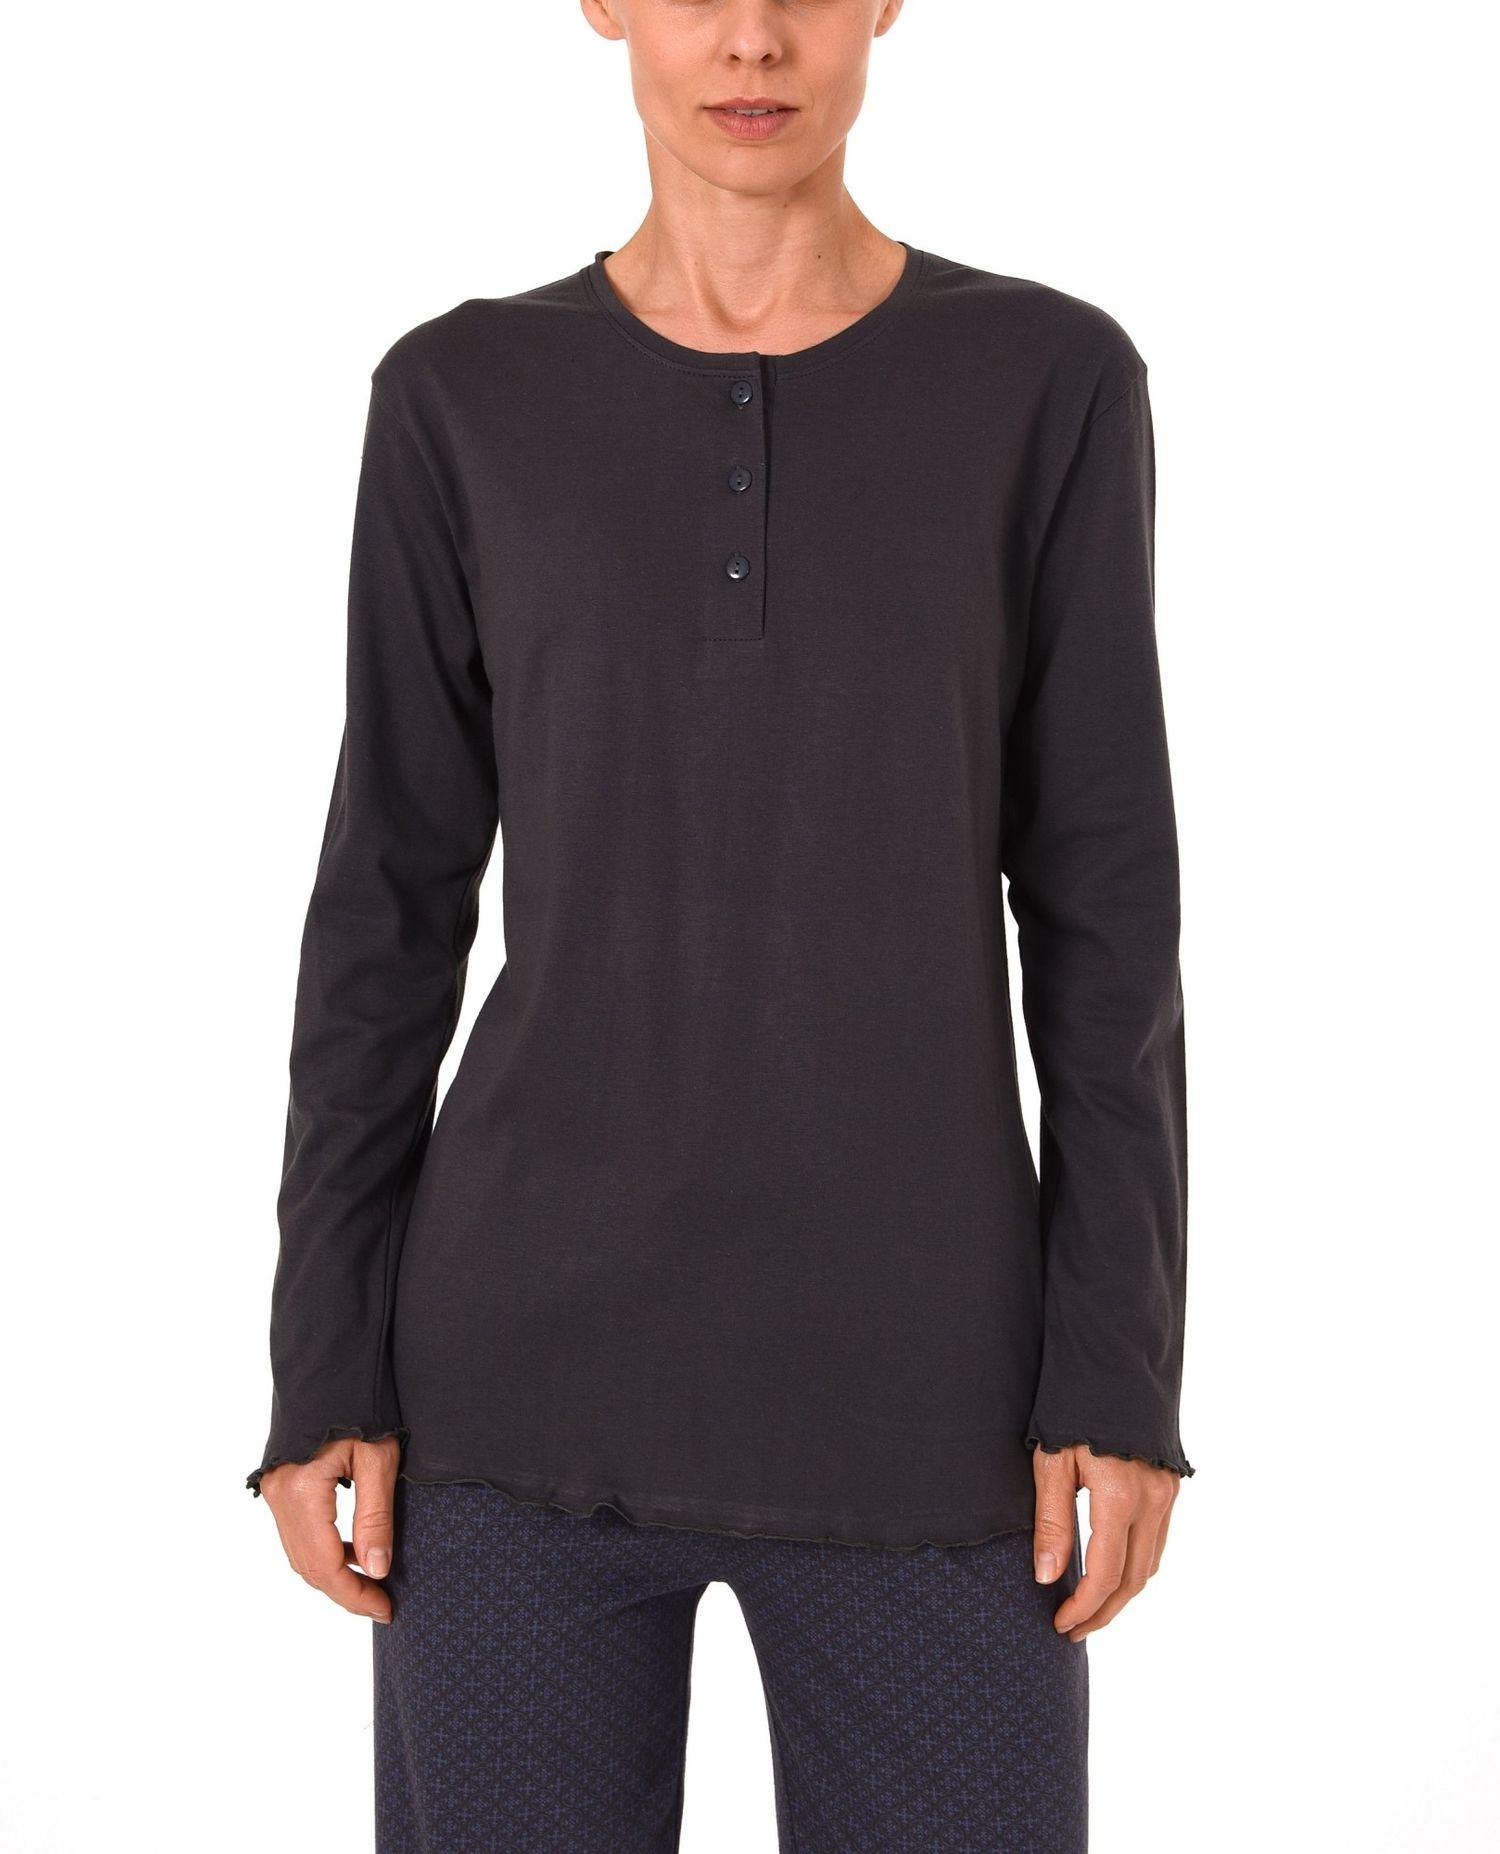 Damen Shirt - Oberteil langarm Mix & Match blau, grau oder beere – 271 219 90 102 – Bild 2